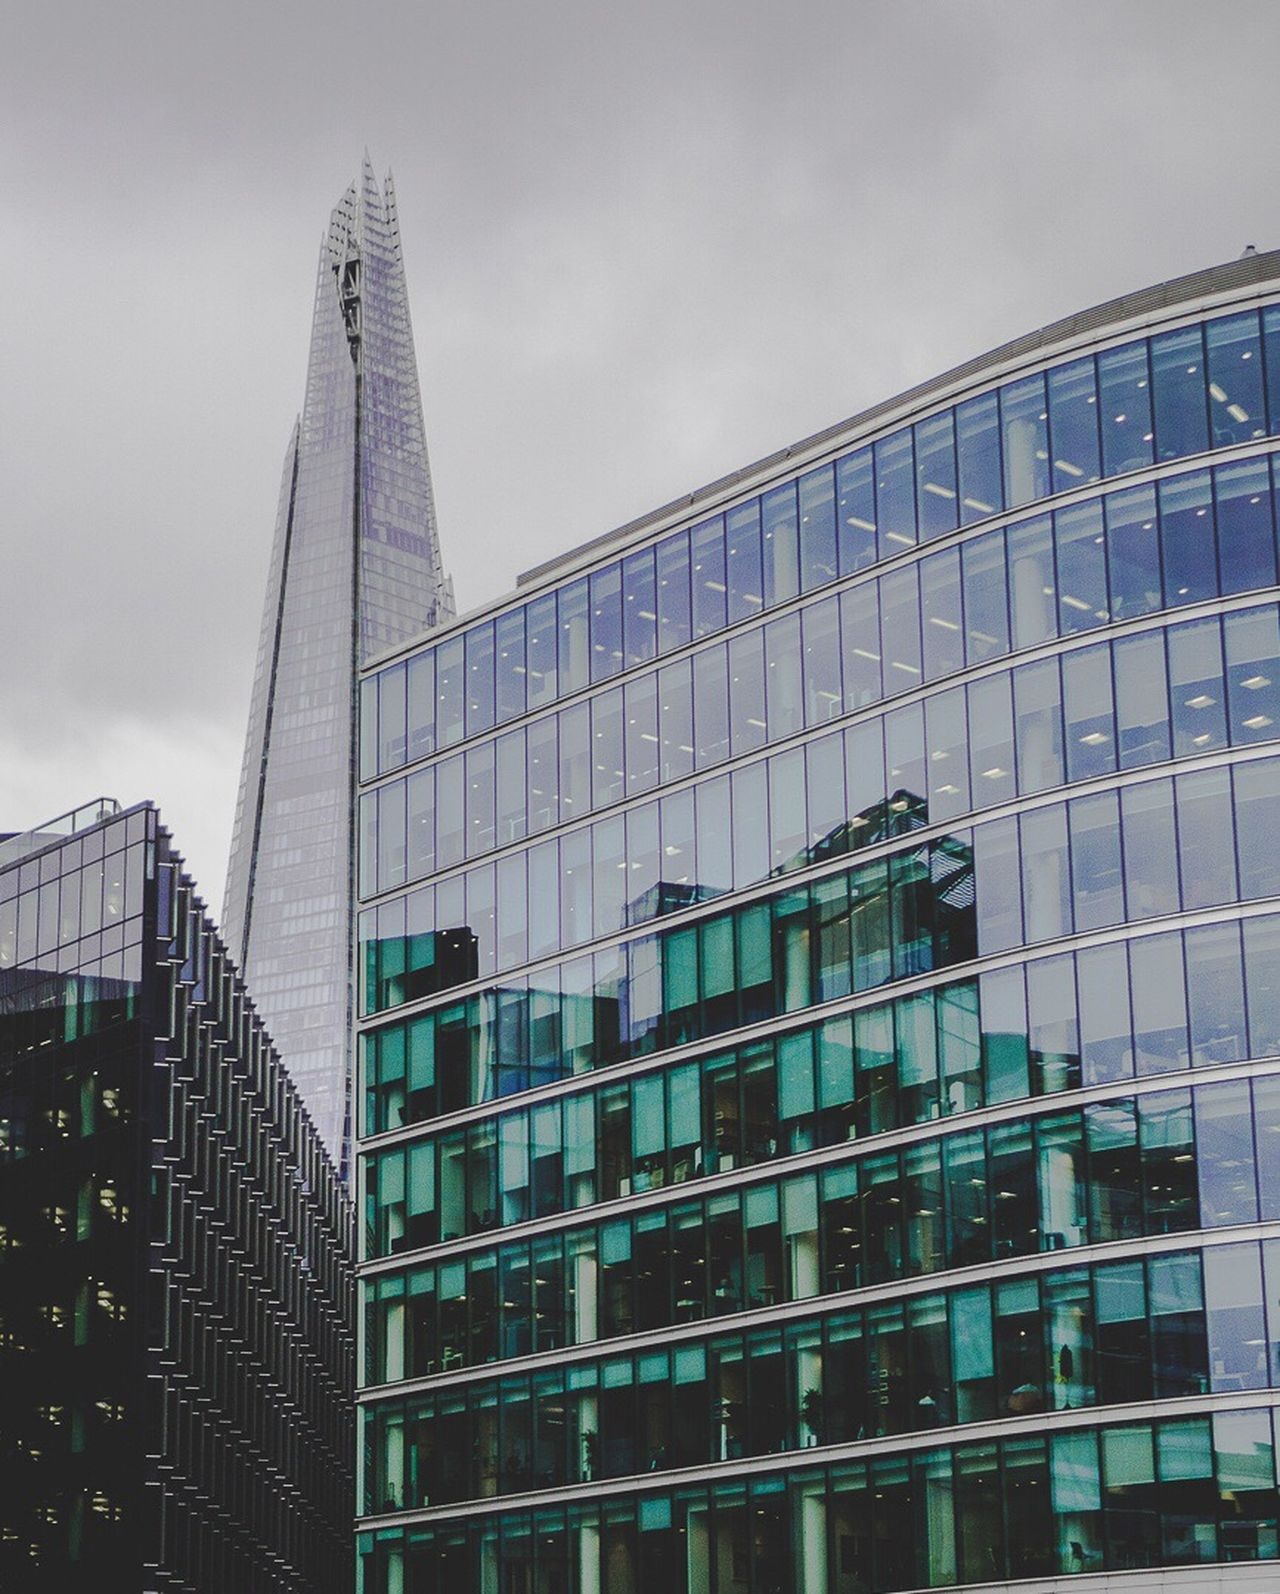 Architecture Modern Built Structure Skyscraper No People City London